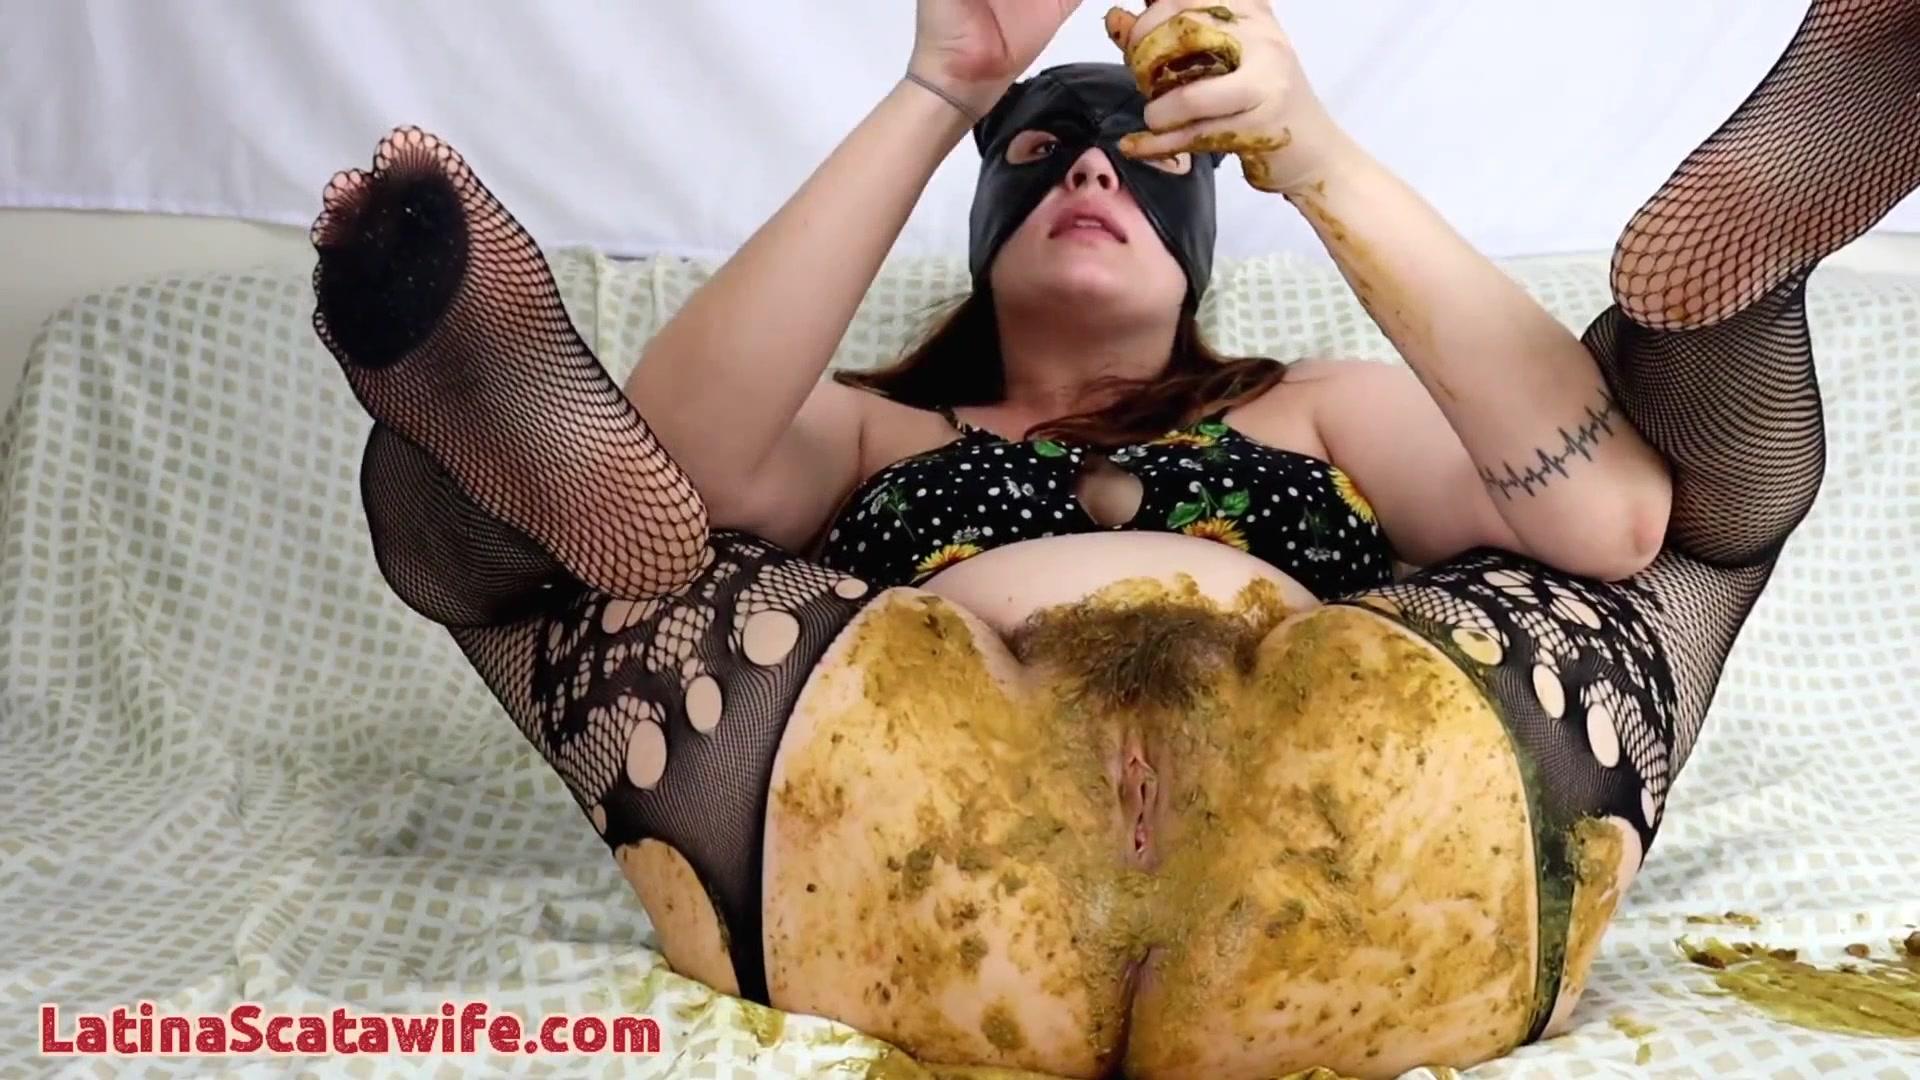 LatinaScatWife - Dirty Wishes 00002